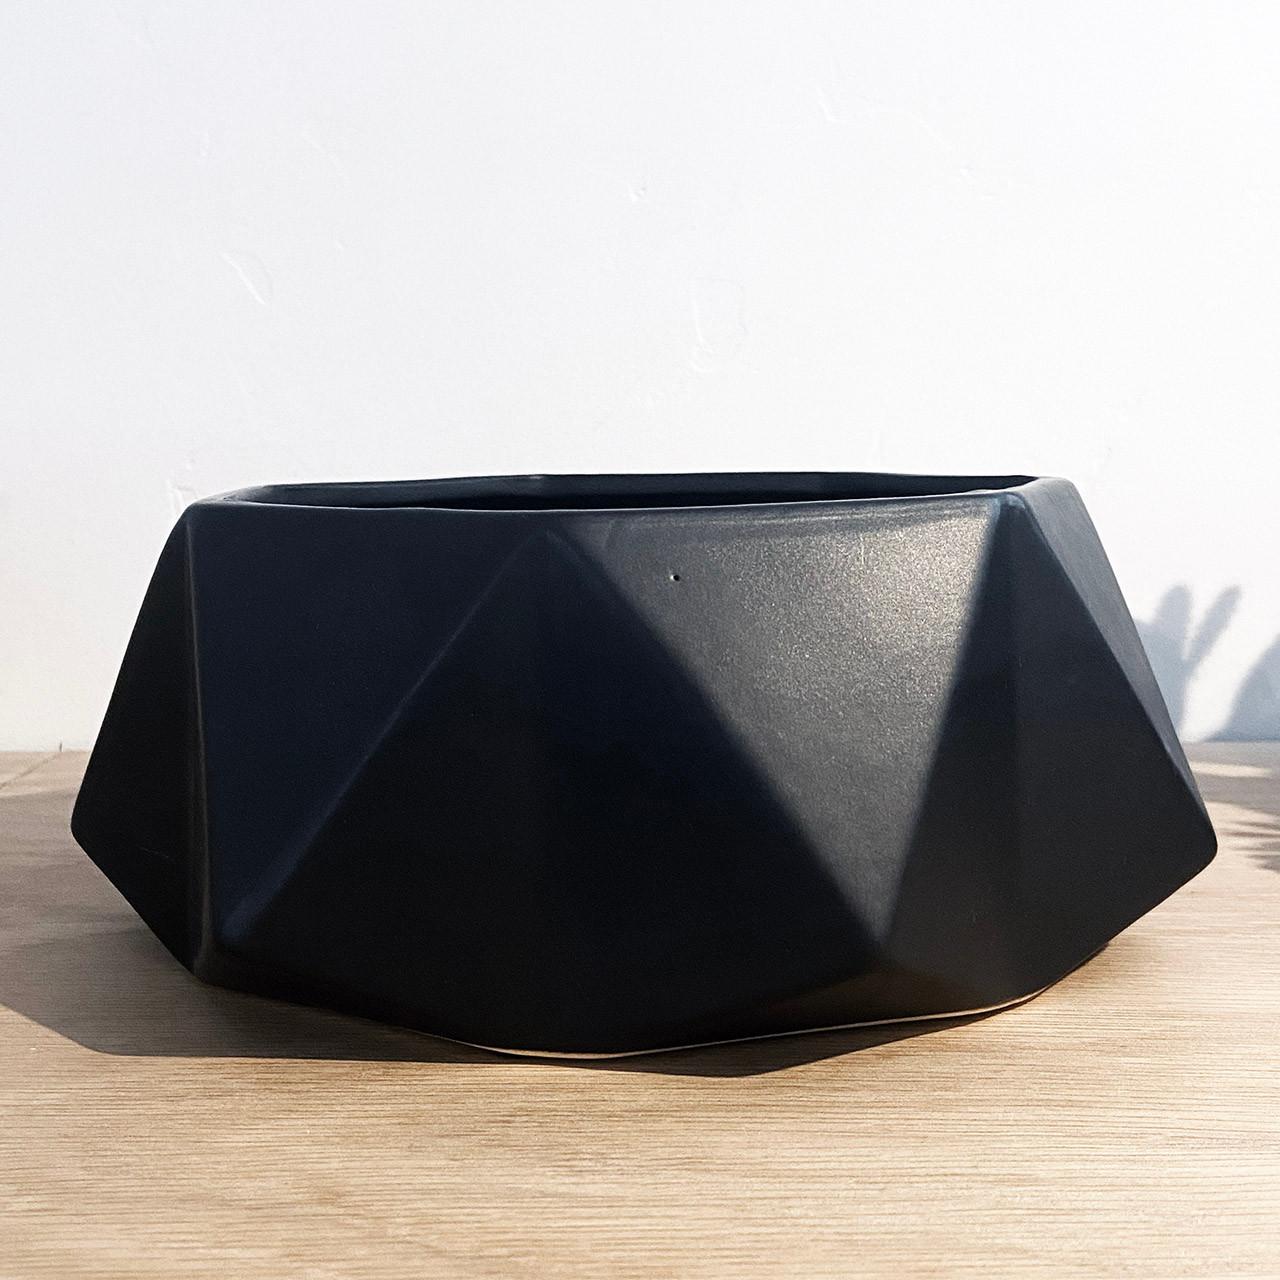 Nero Marquina Pot